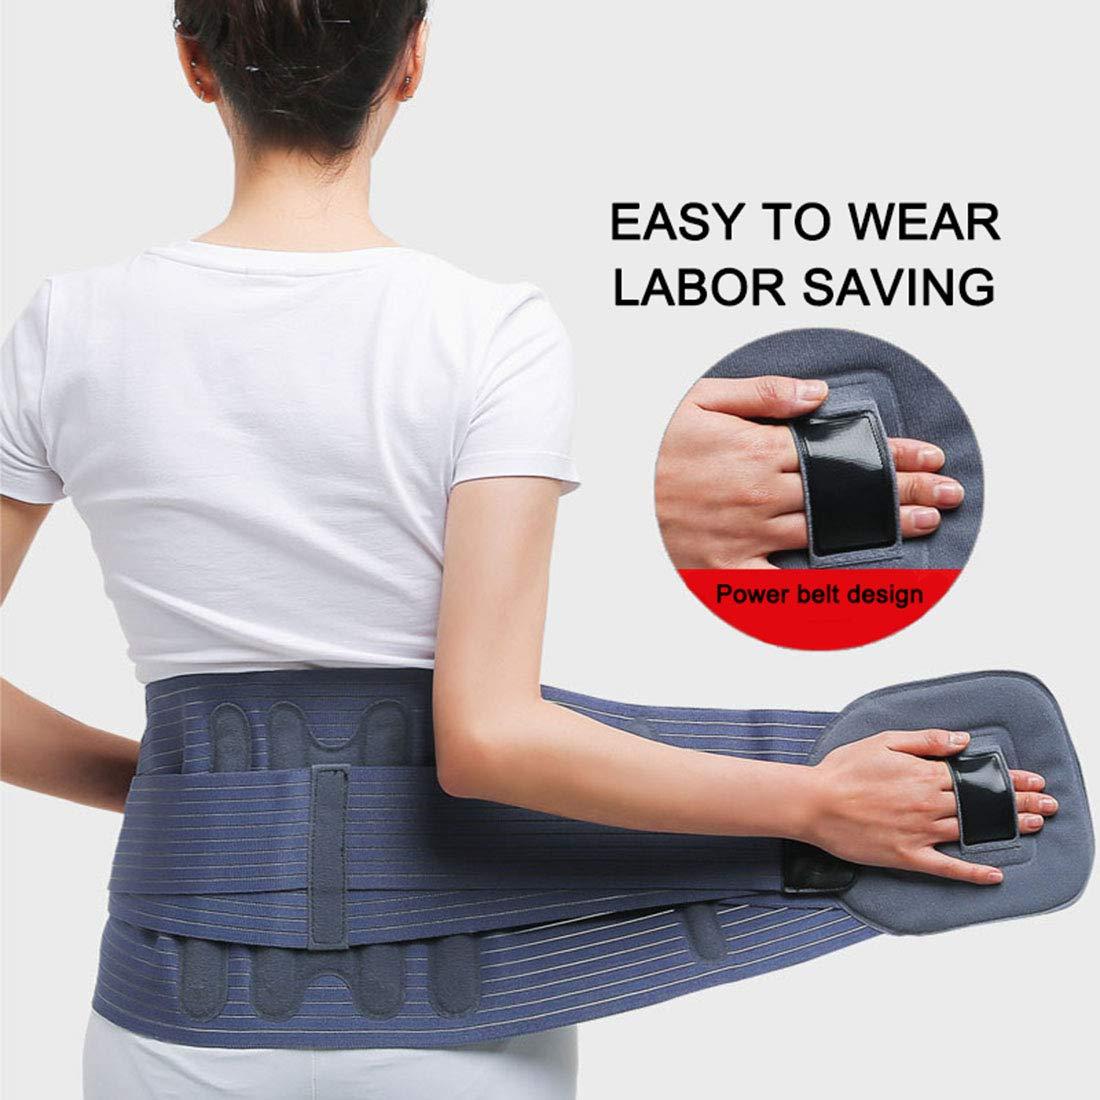 Women Body Shaping Lumbar Belt Men Running Waist Band for Yoga Fitness Training Posture Correction Ball Sports Etc,Lumbar Disc Herniation Strain Fixing Strap